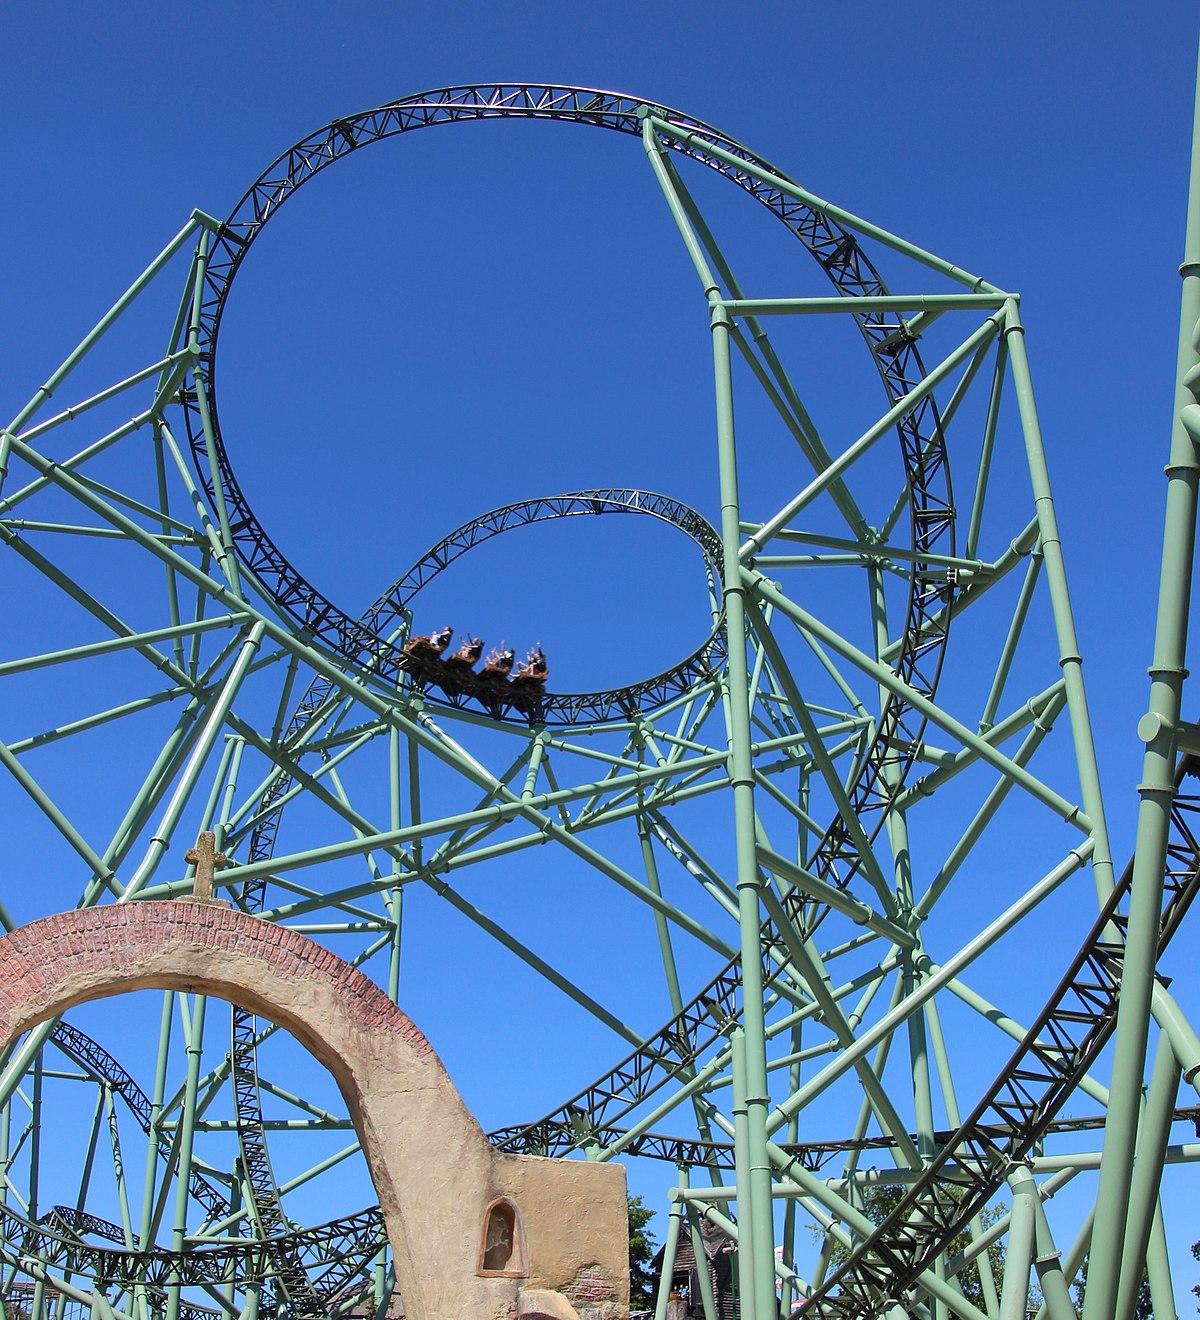 K 228 Rnan Roller Coaster Wikipedia